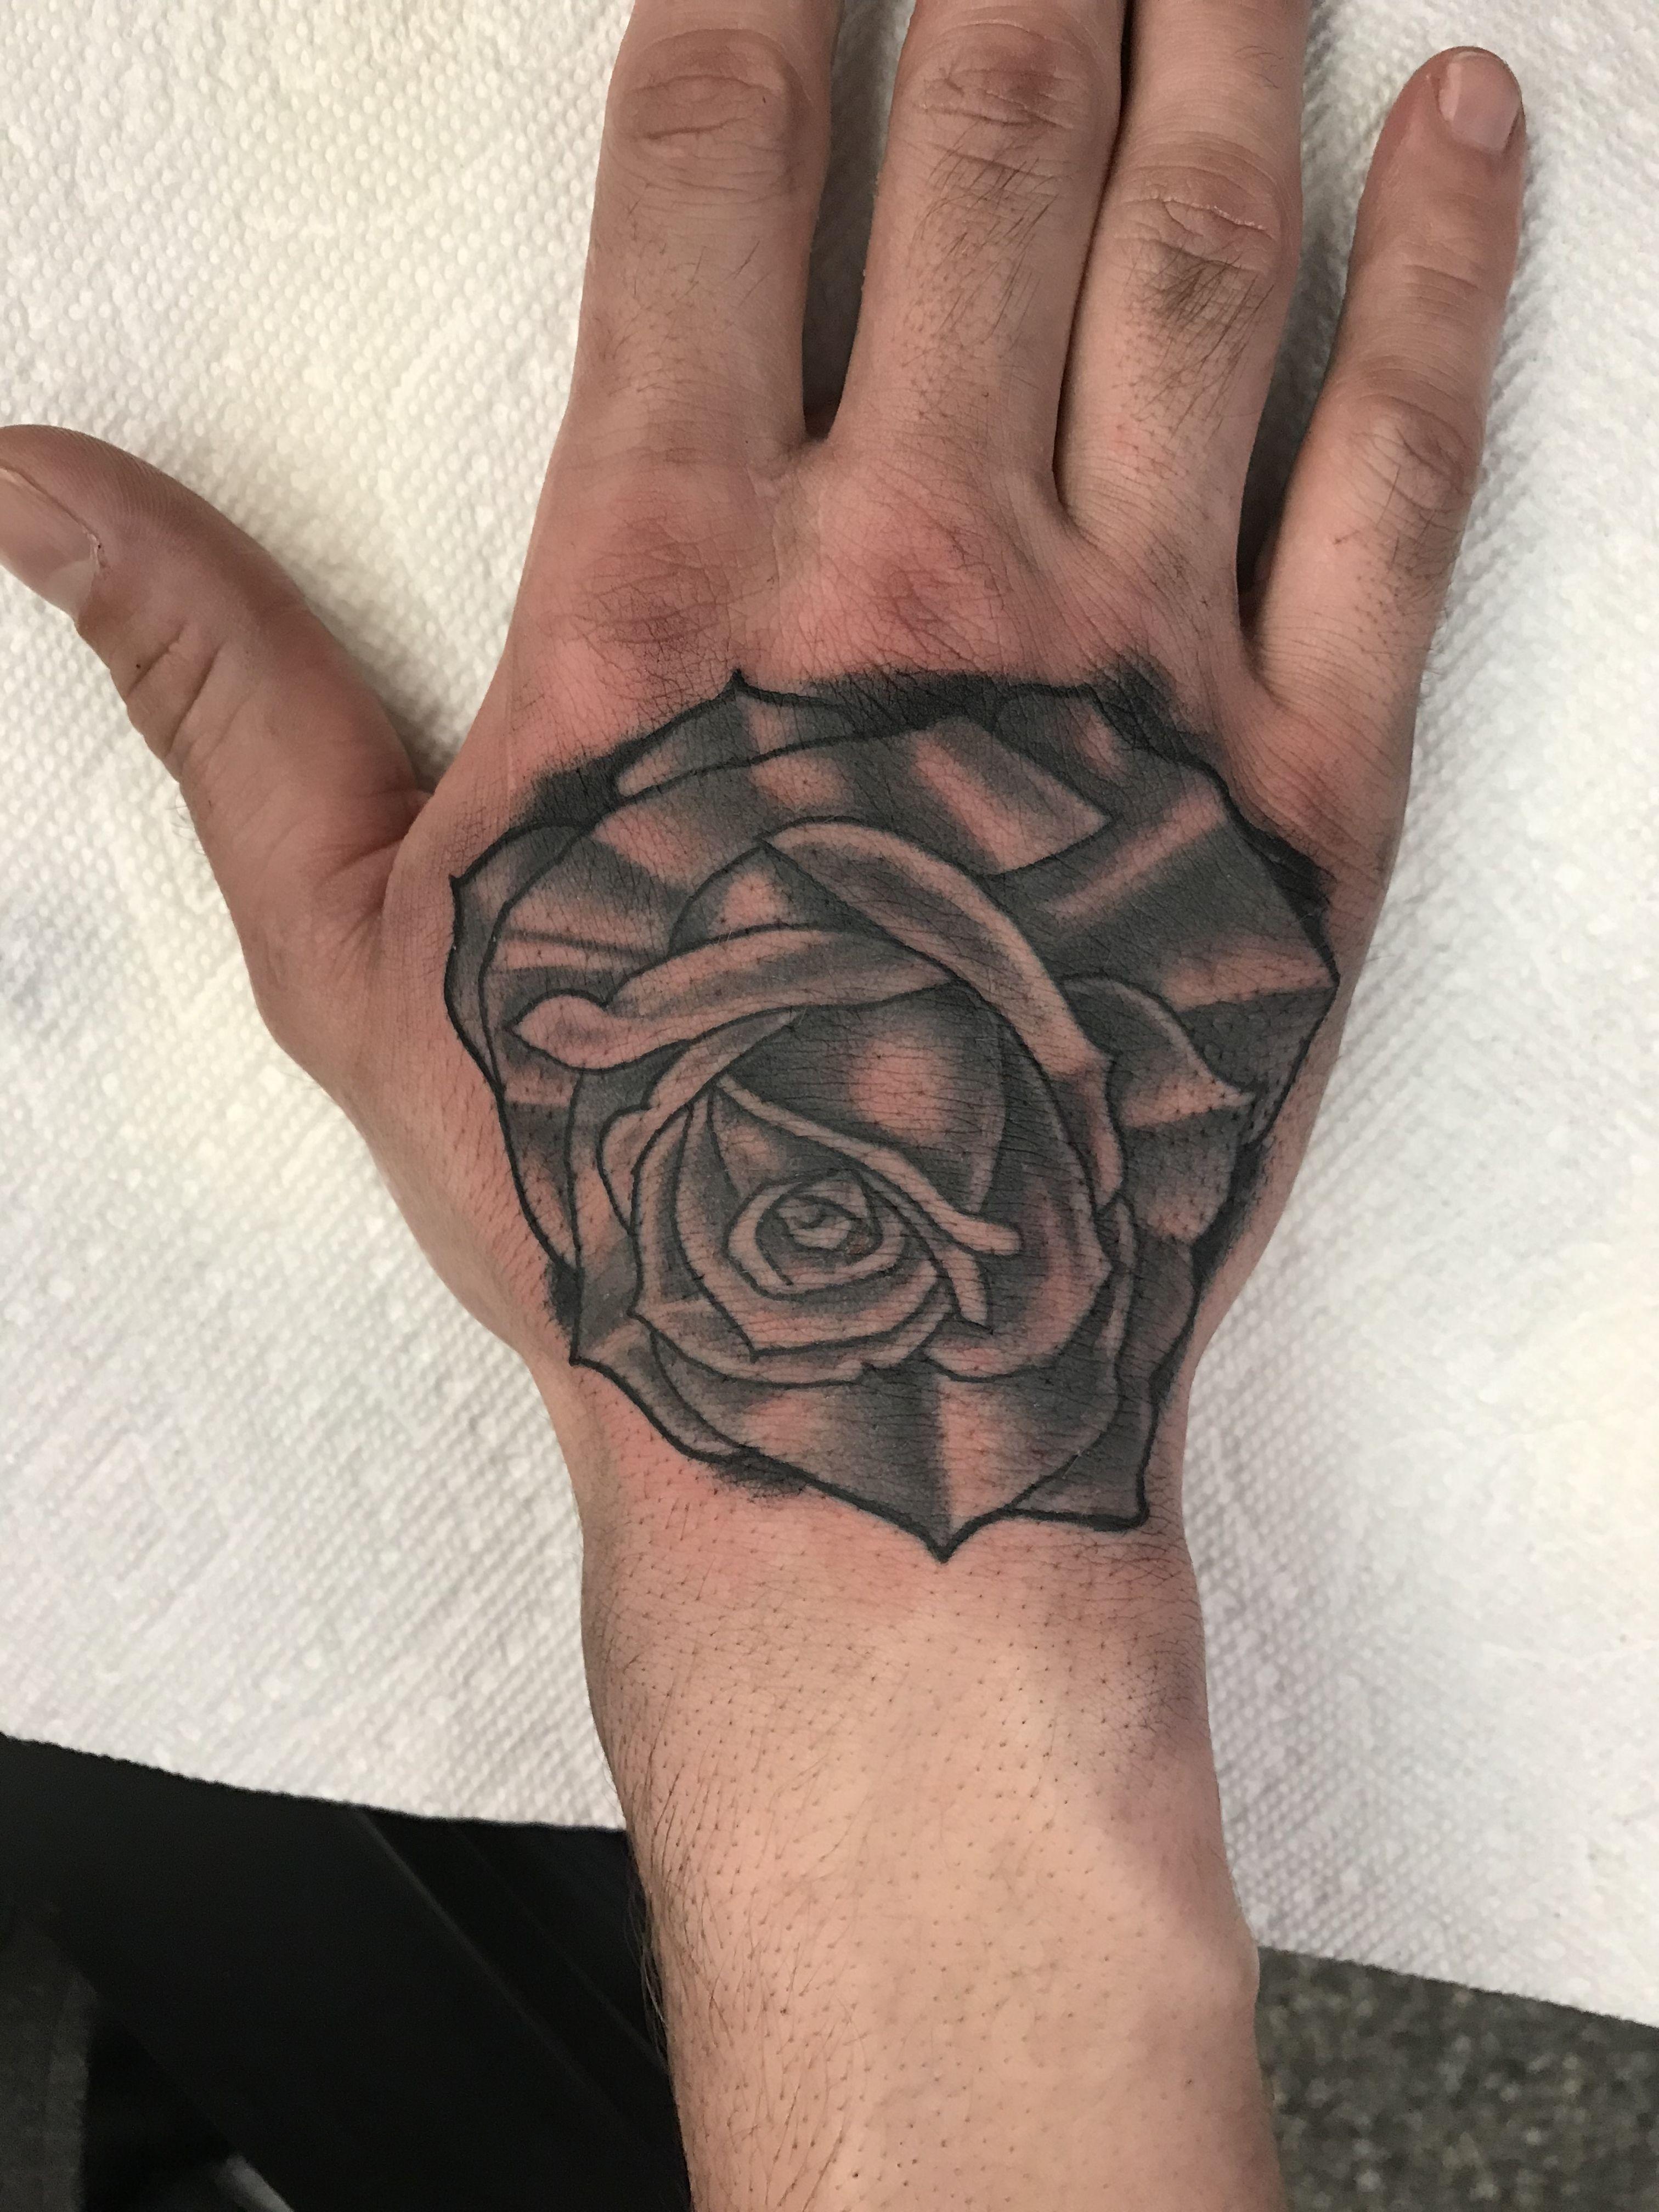 Black and grey rose hand tattoo rose hand tattoo hand